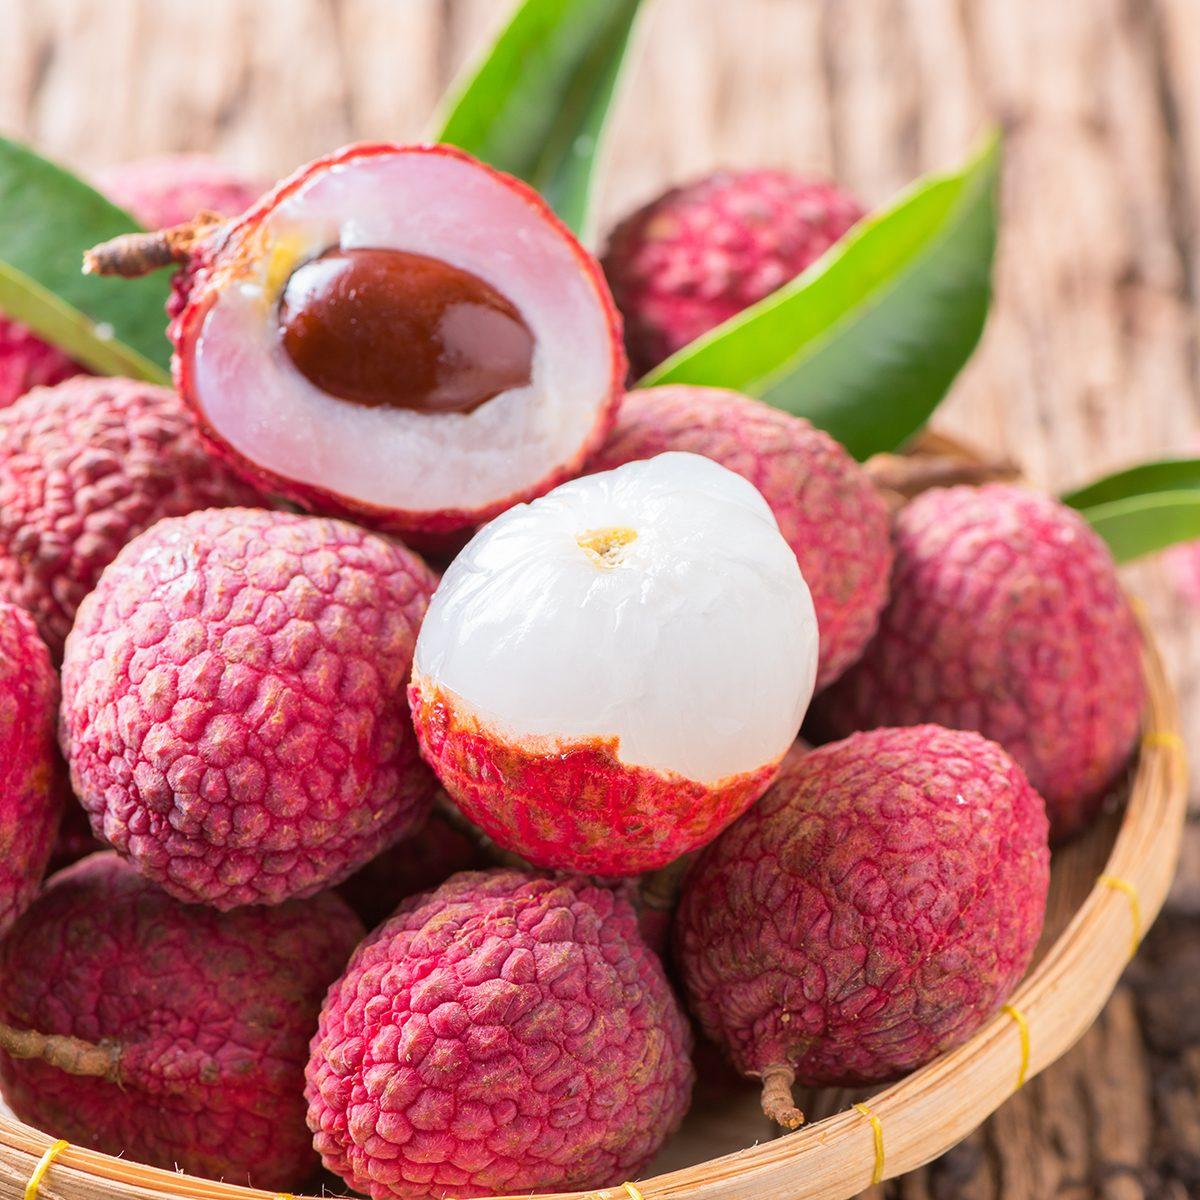 fresh organic lychee fruit on bamboo basket and old wood background